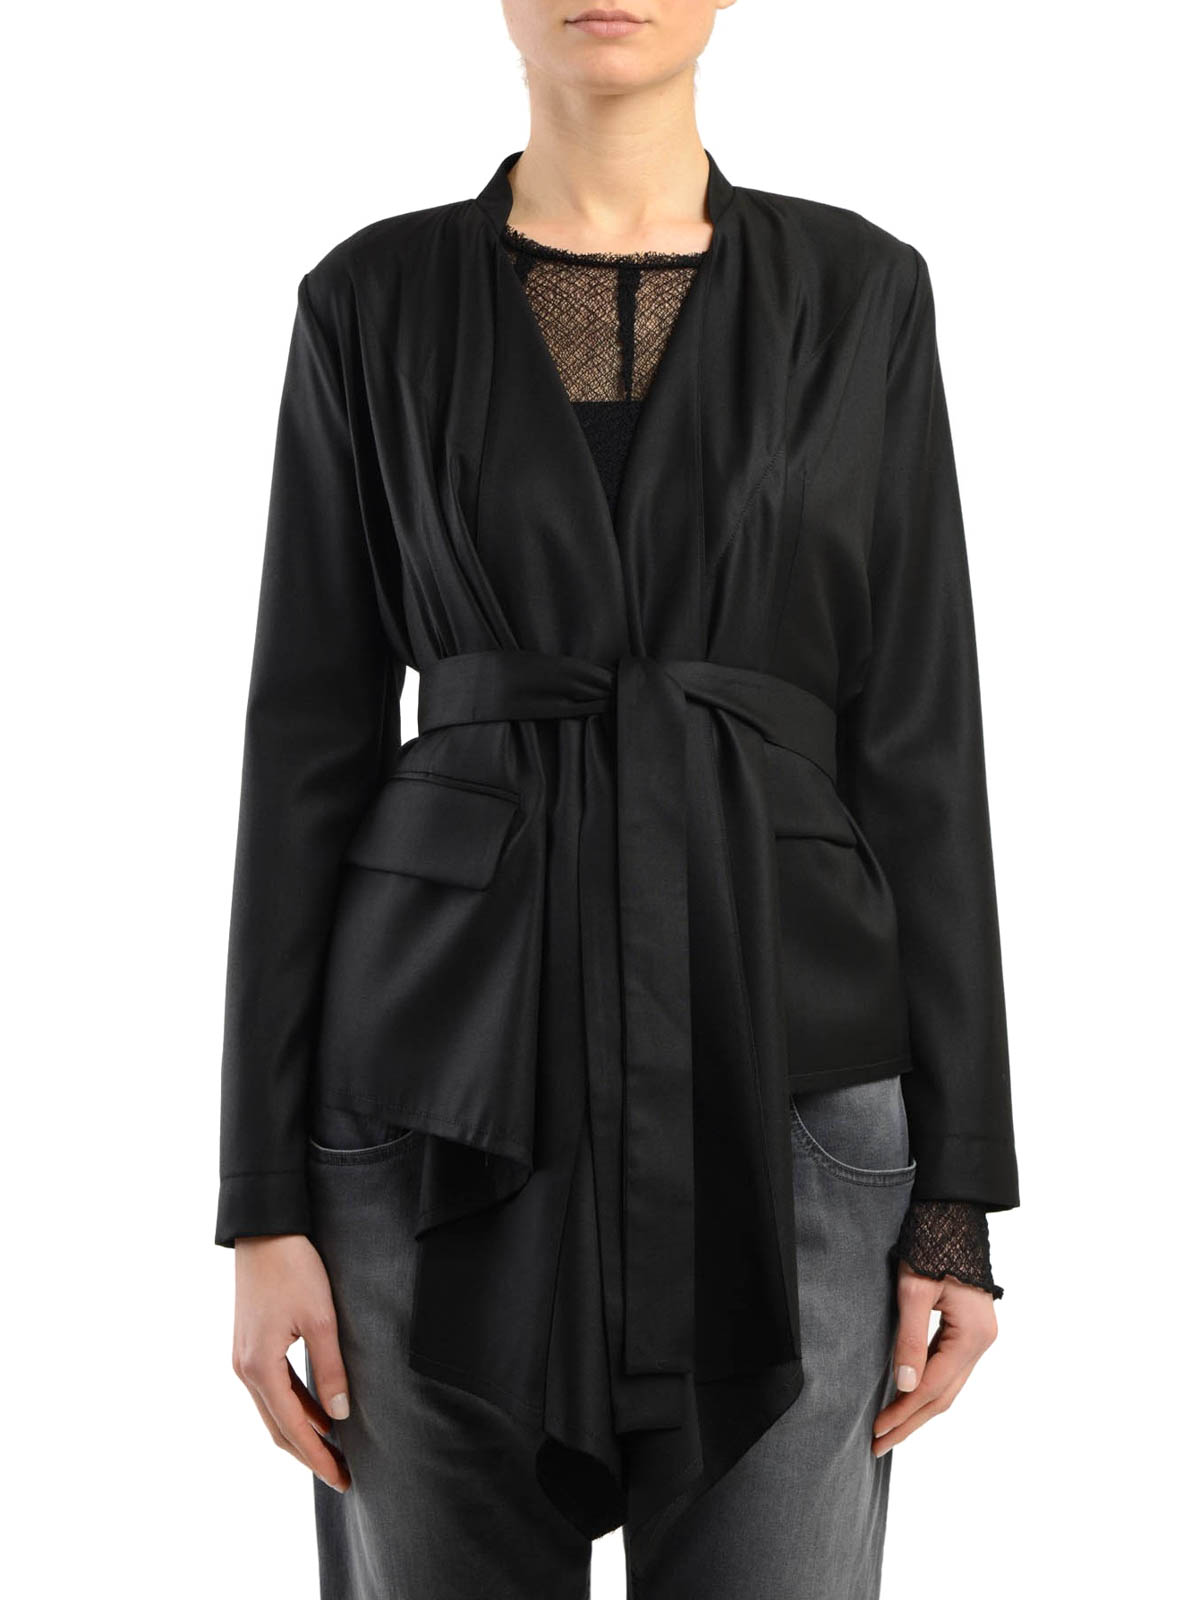 jacket shop drapes jackets rvca blk draped womens remake product canada